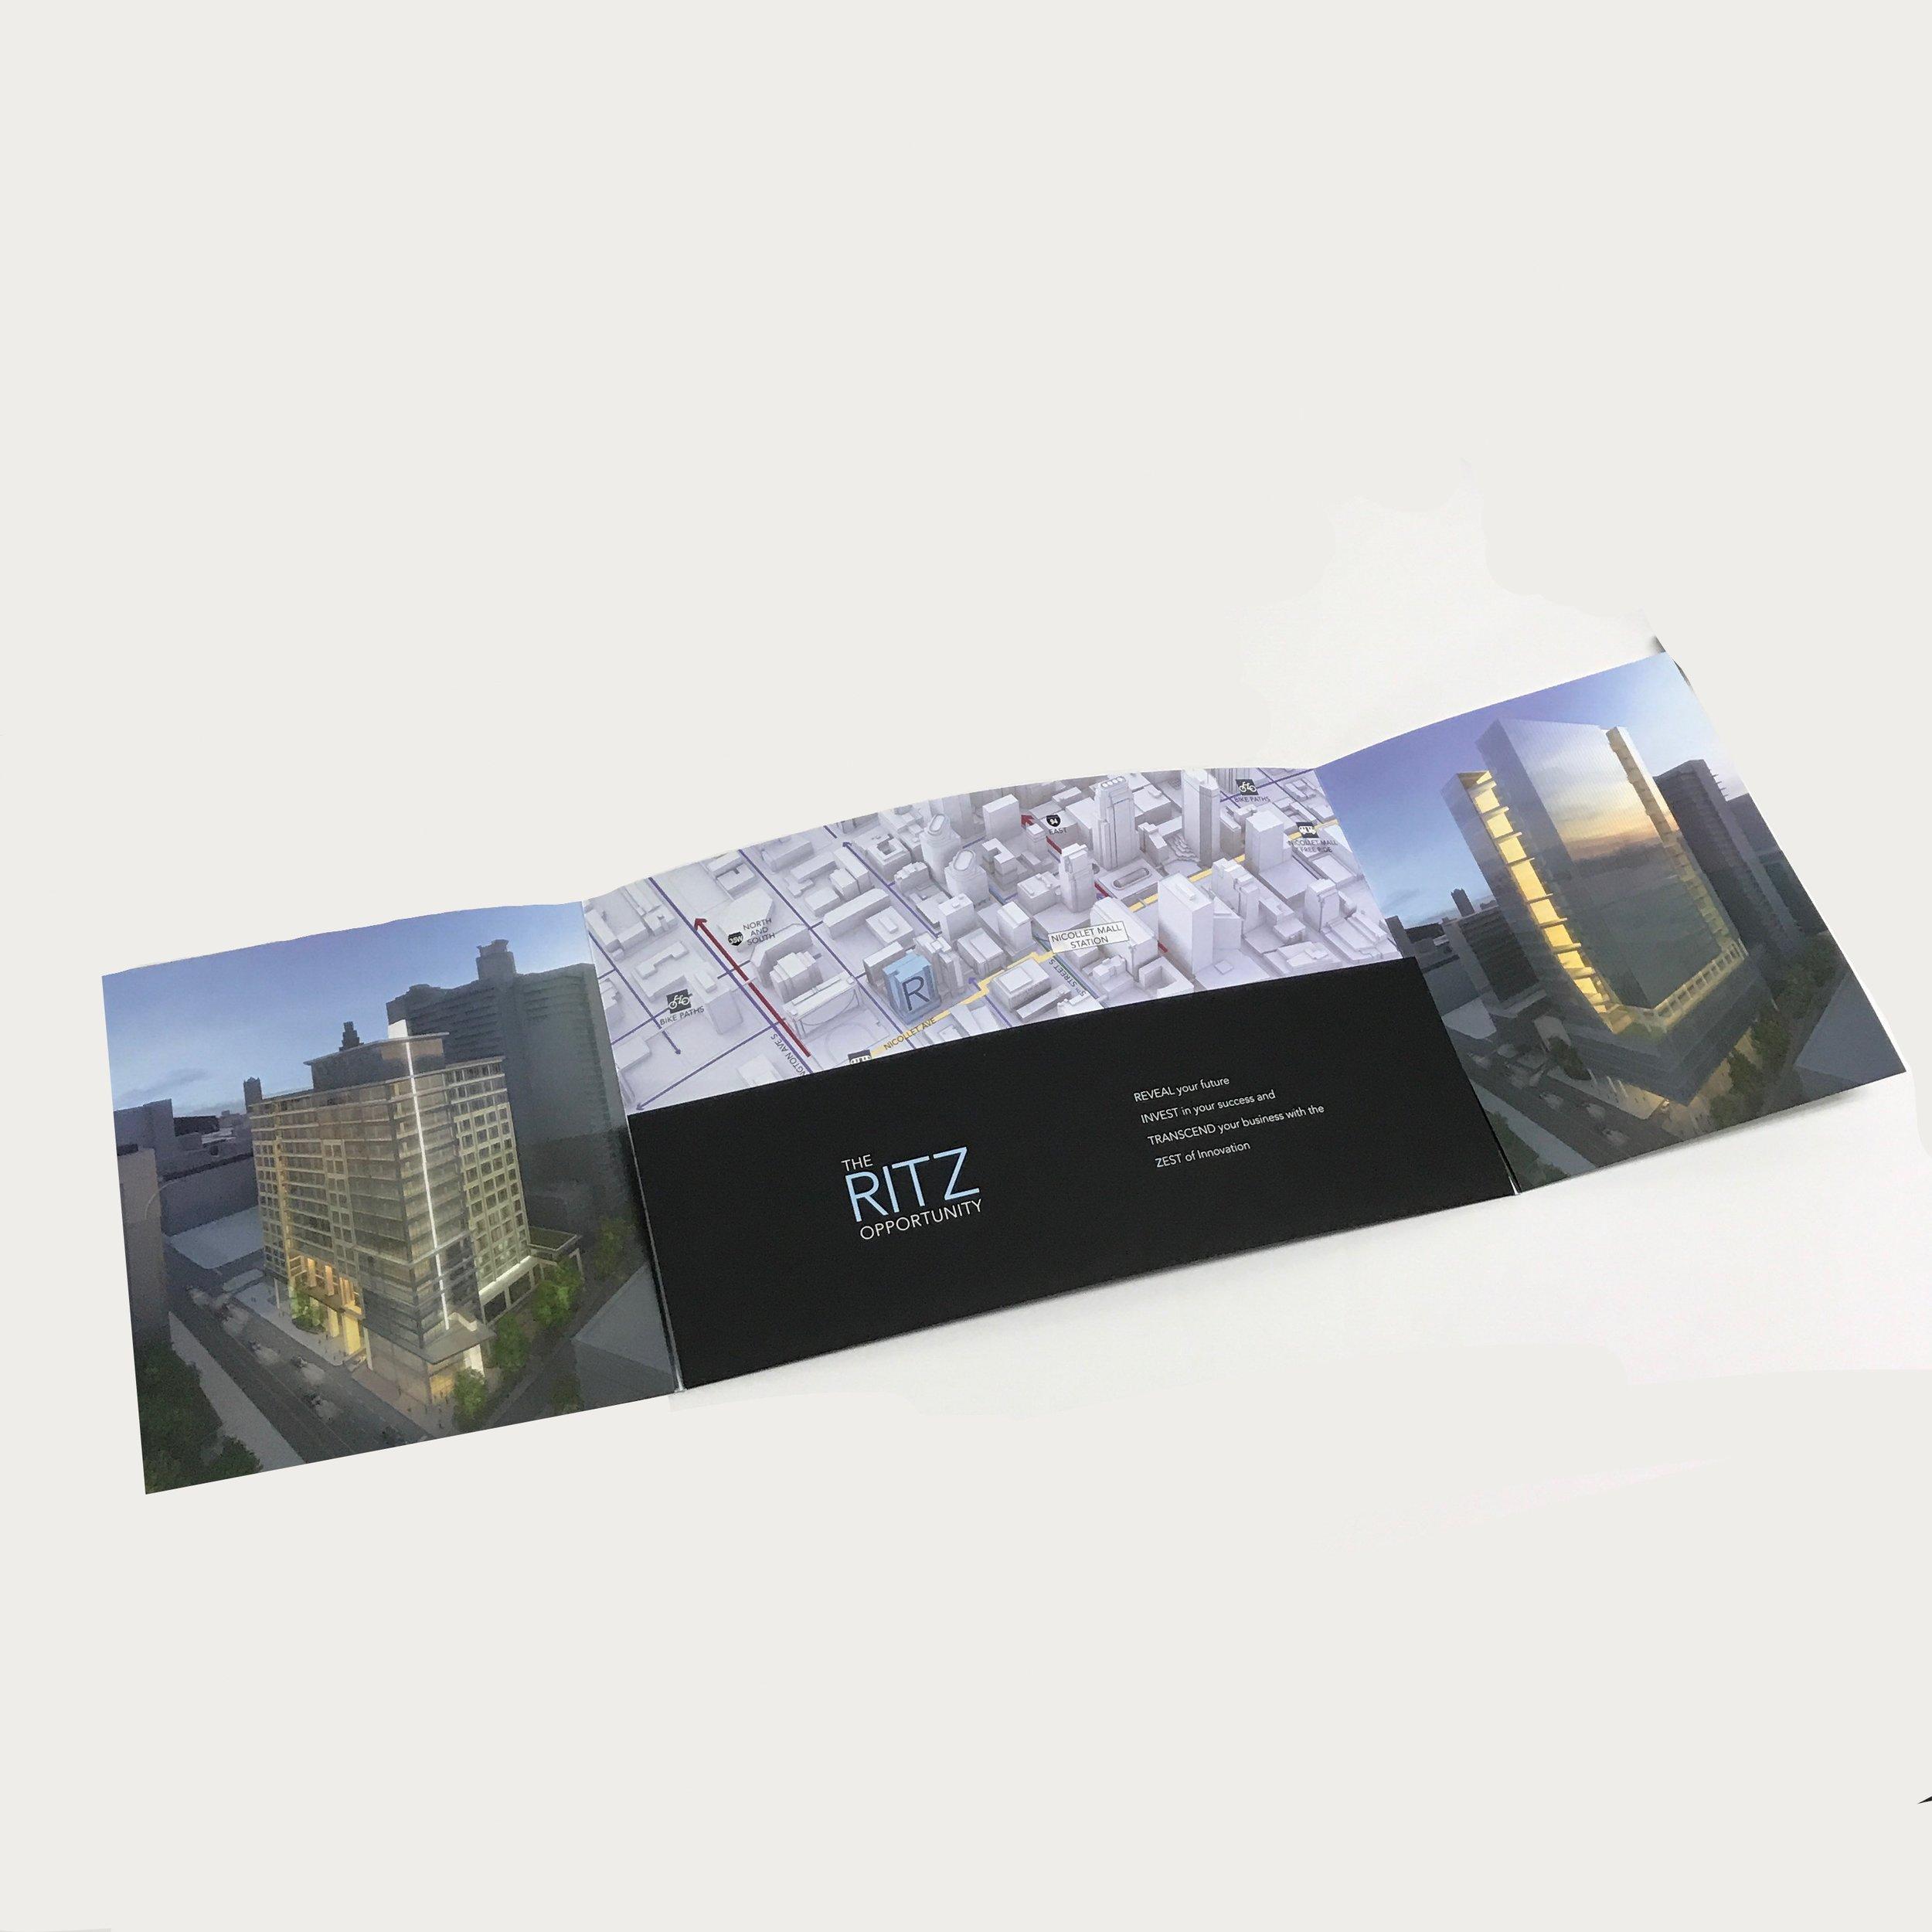 Corporate custom proposal folder printed in Minneapolis by Anderberg Print